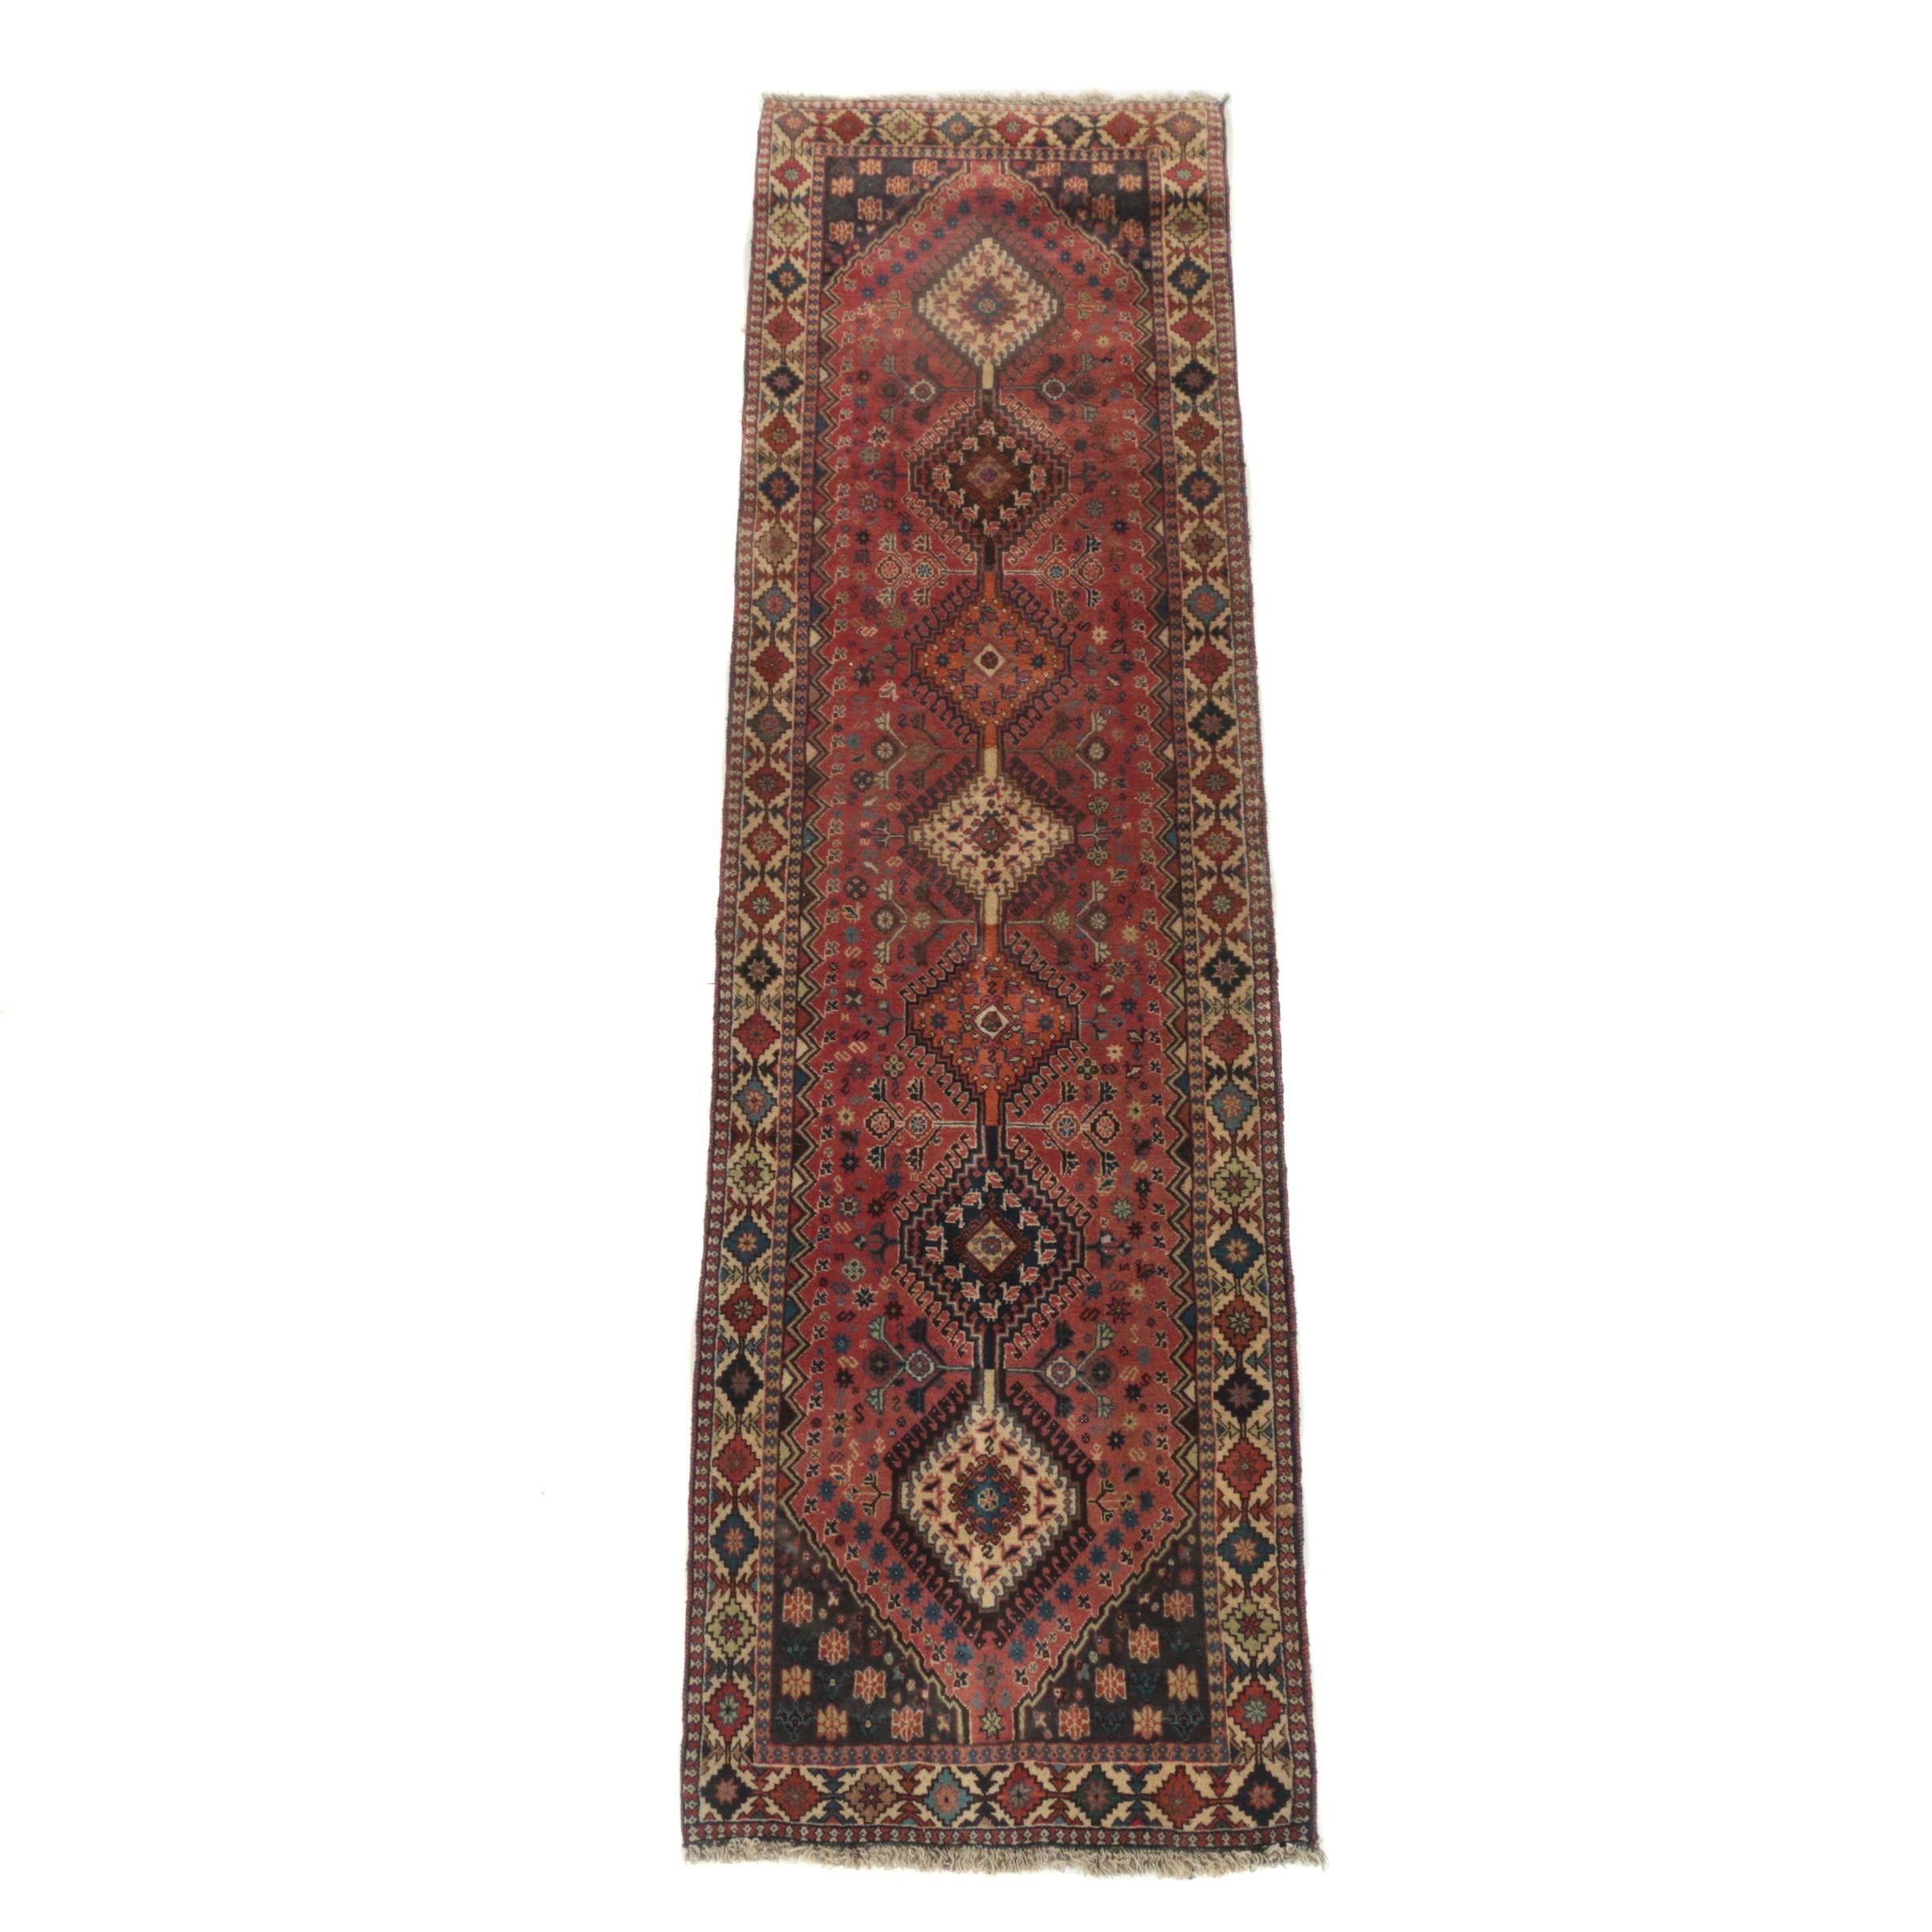 Hand-Knotted Persian Yalameh Wool Carpet Runner